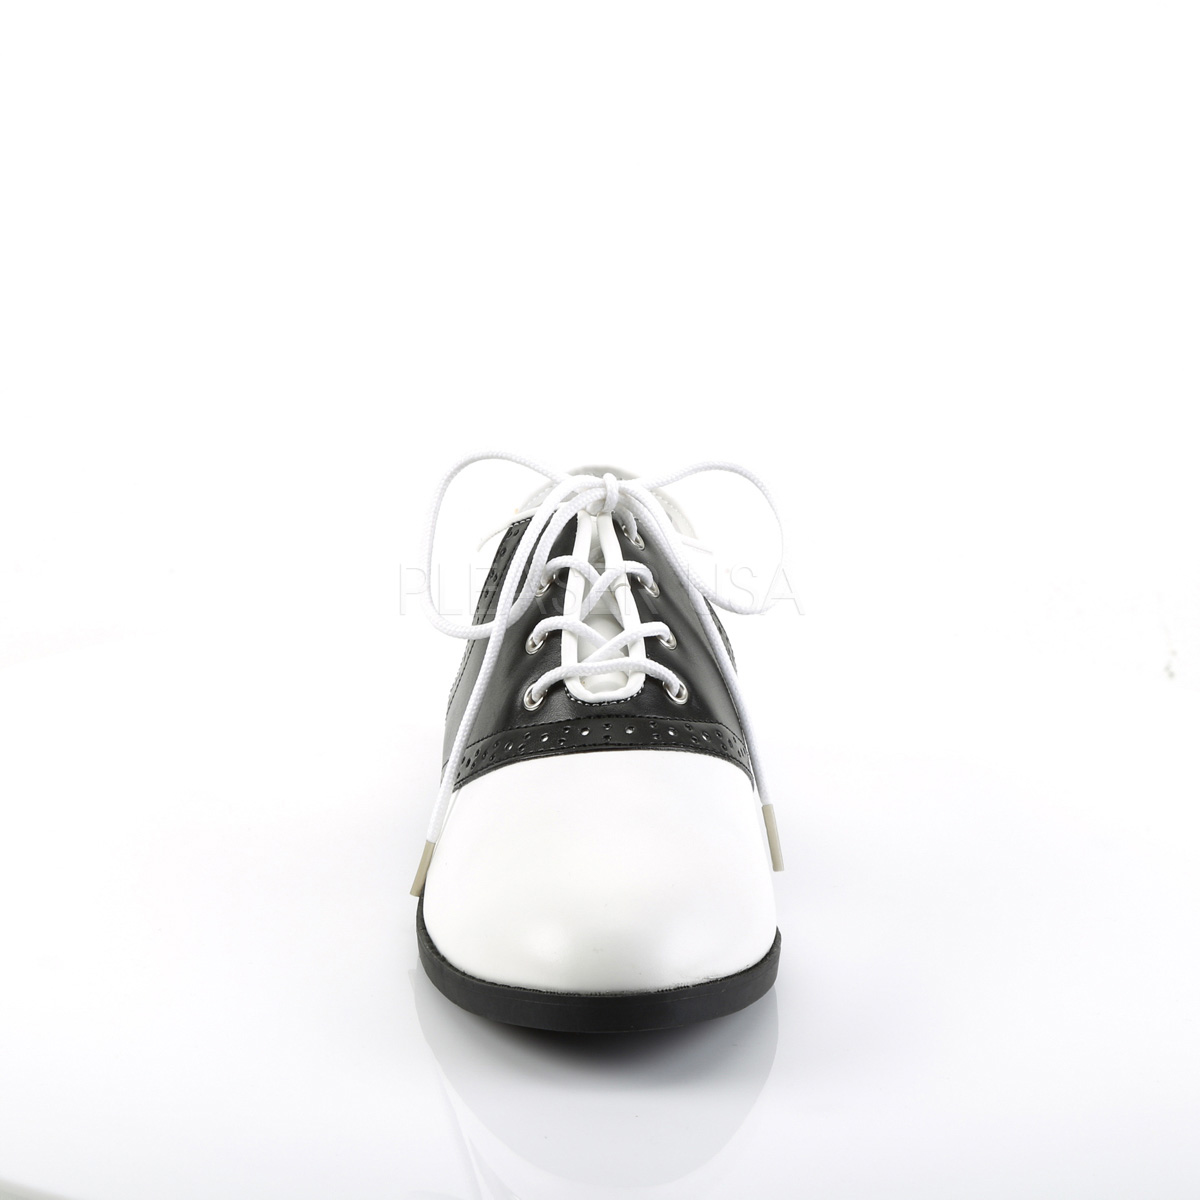 FUNTASMA(Pleaser) SADDLE-50 サドルシューズ ブラック/ホワイト白/黒 2トーン プリーザー◆取り寄せ